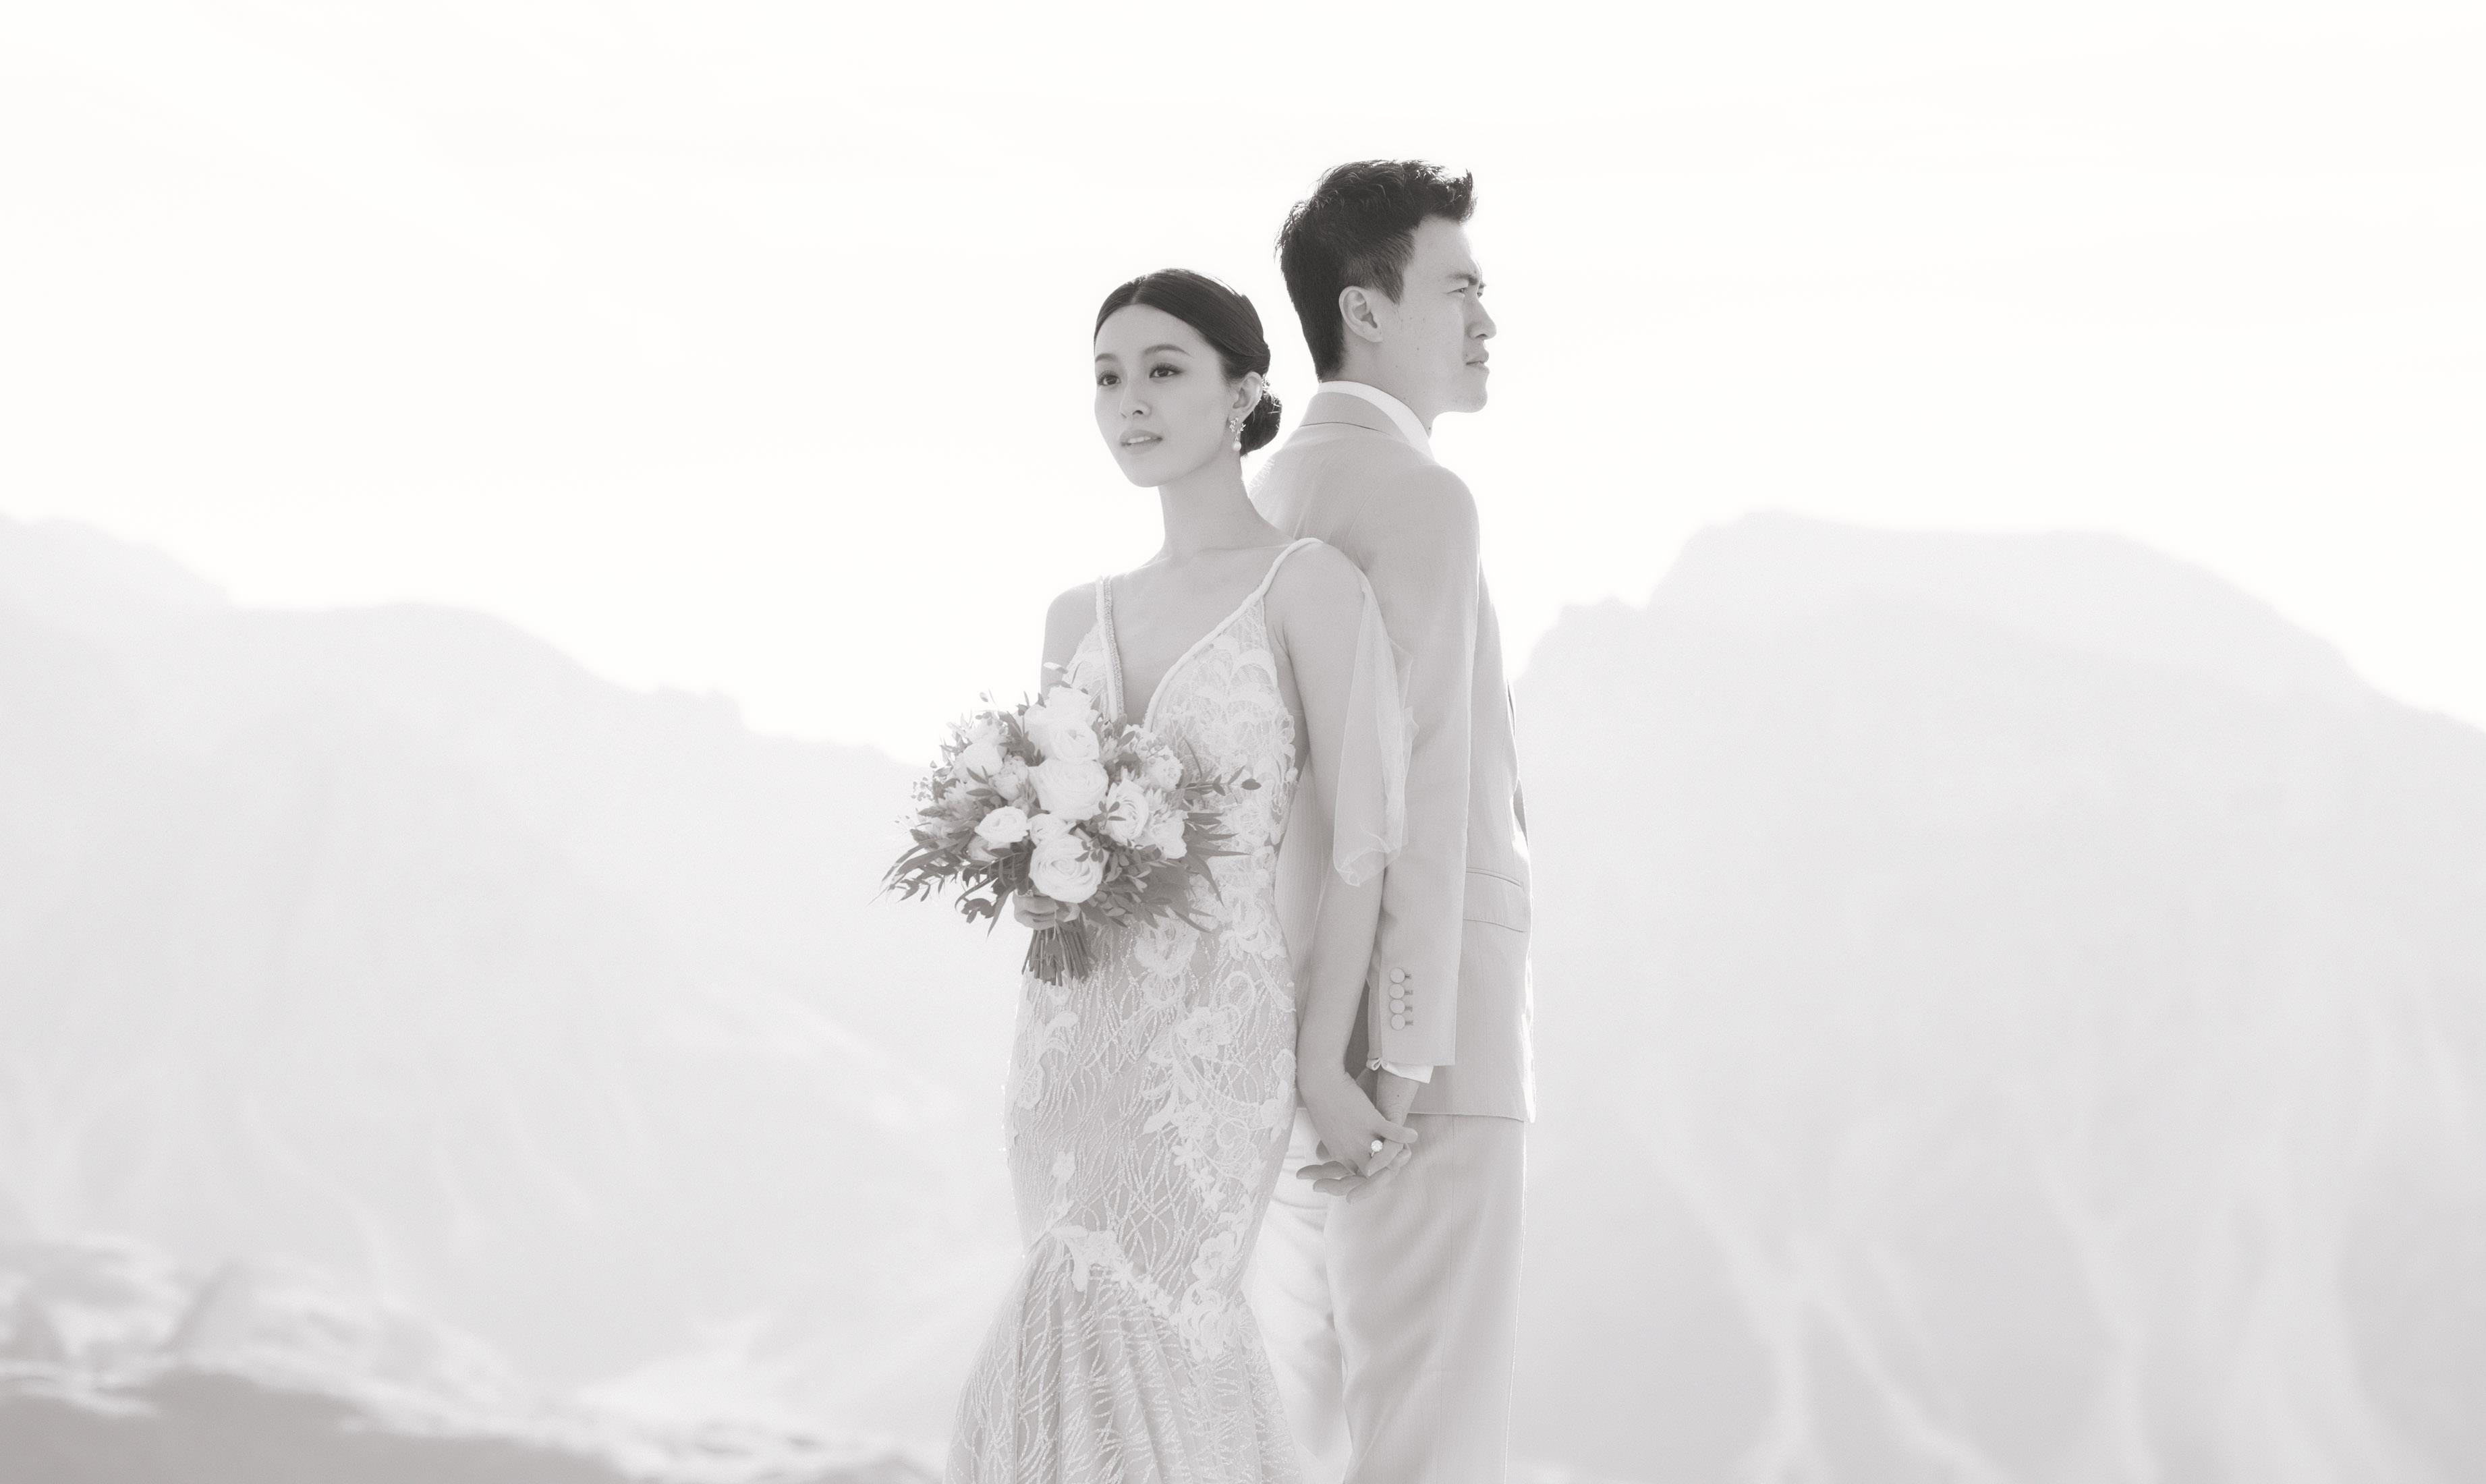 Carl & Janice – Pre-Wedding